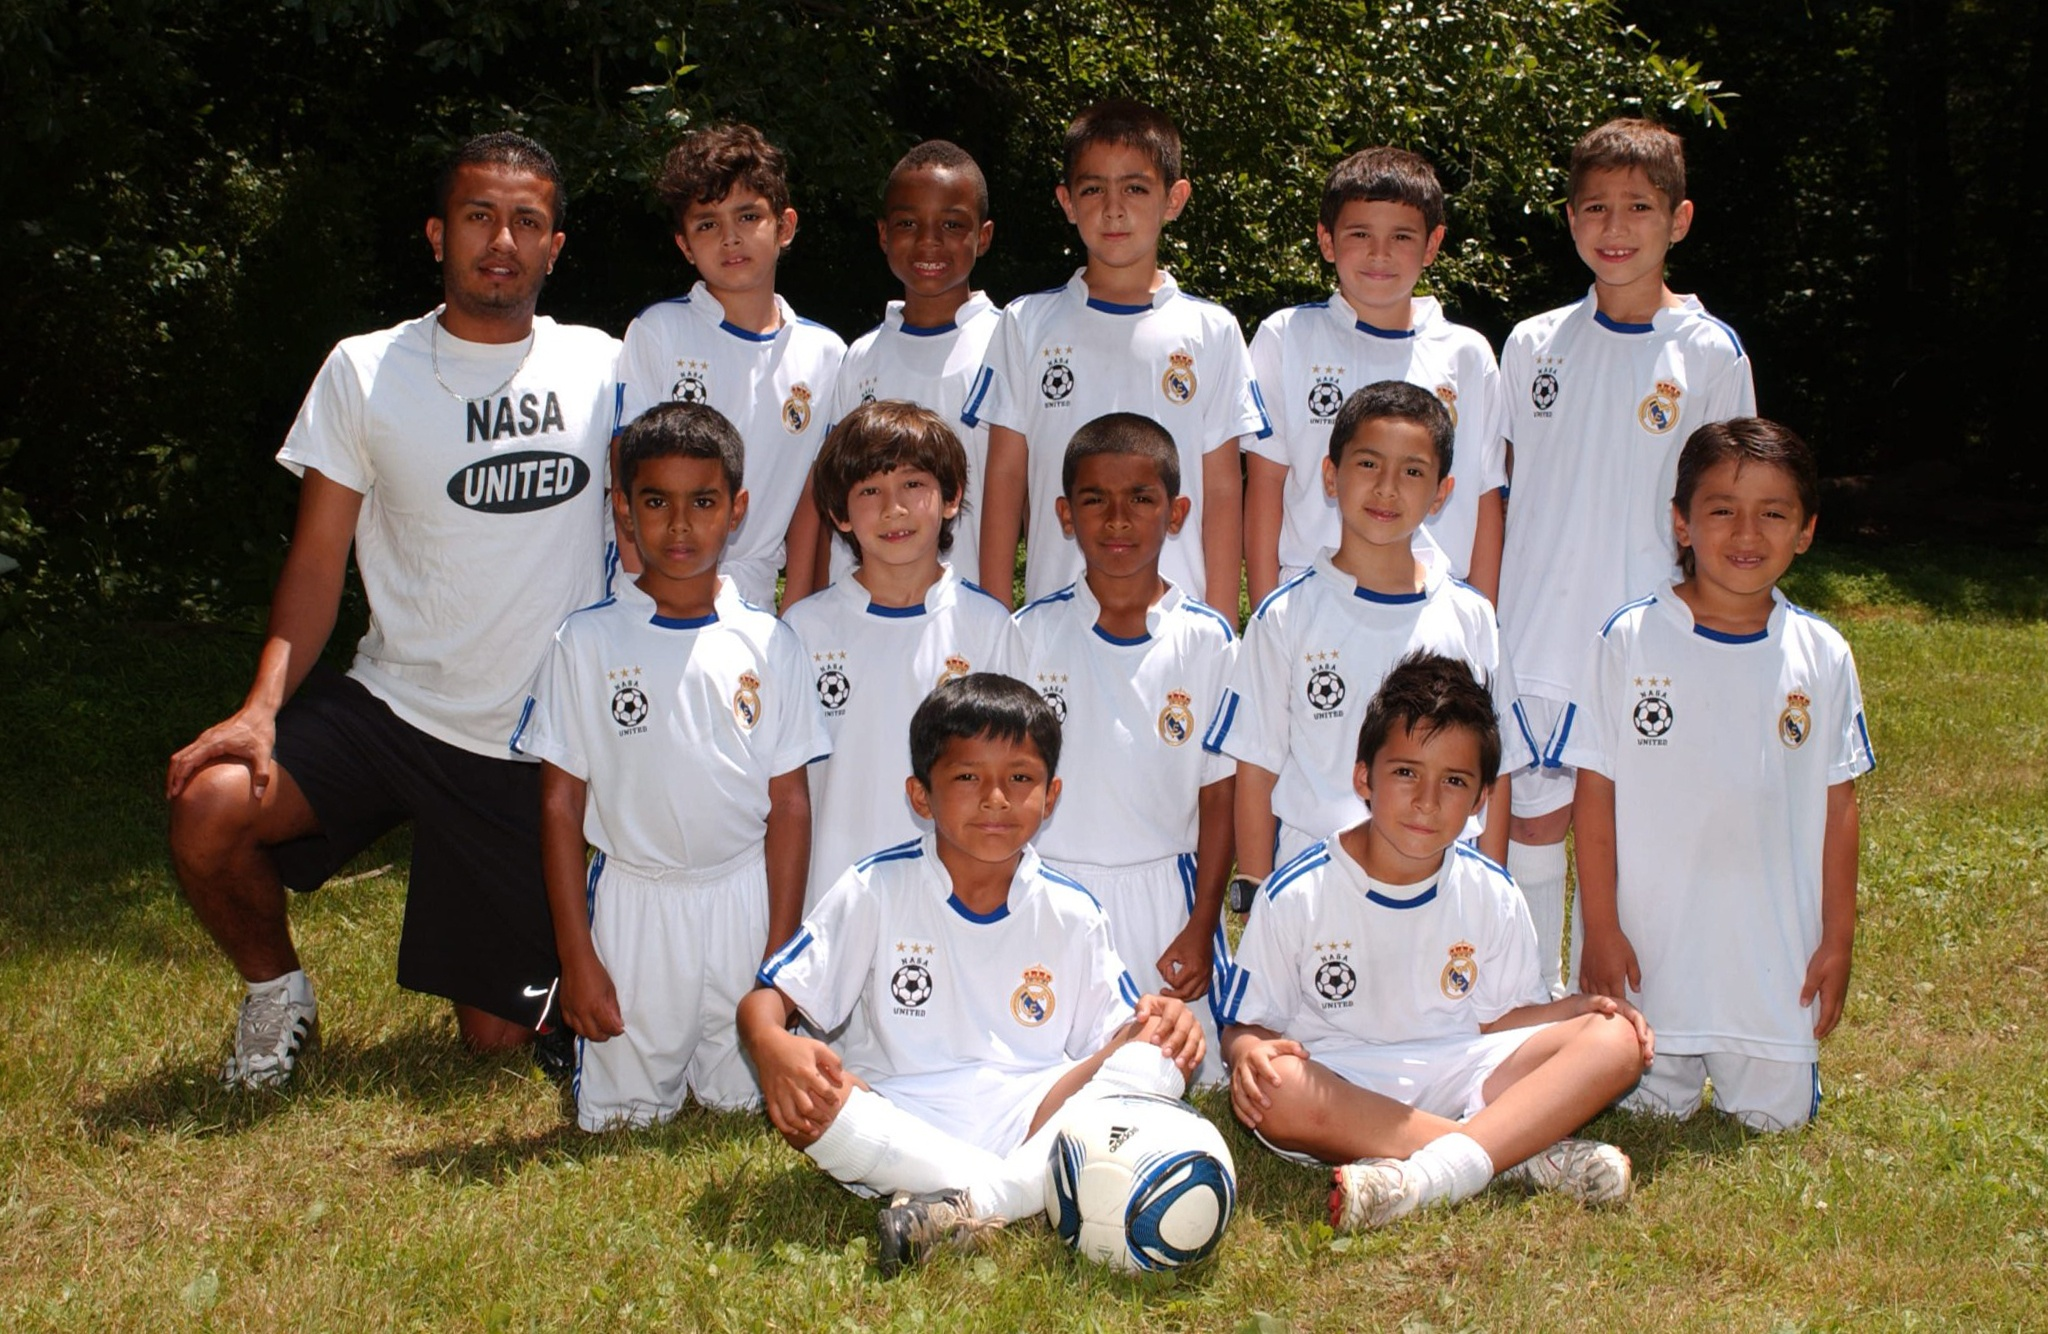 nasa soccer girls - photo #31